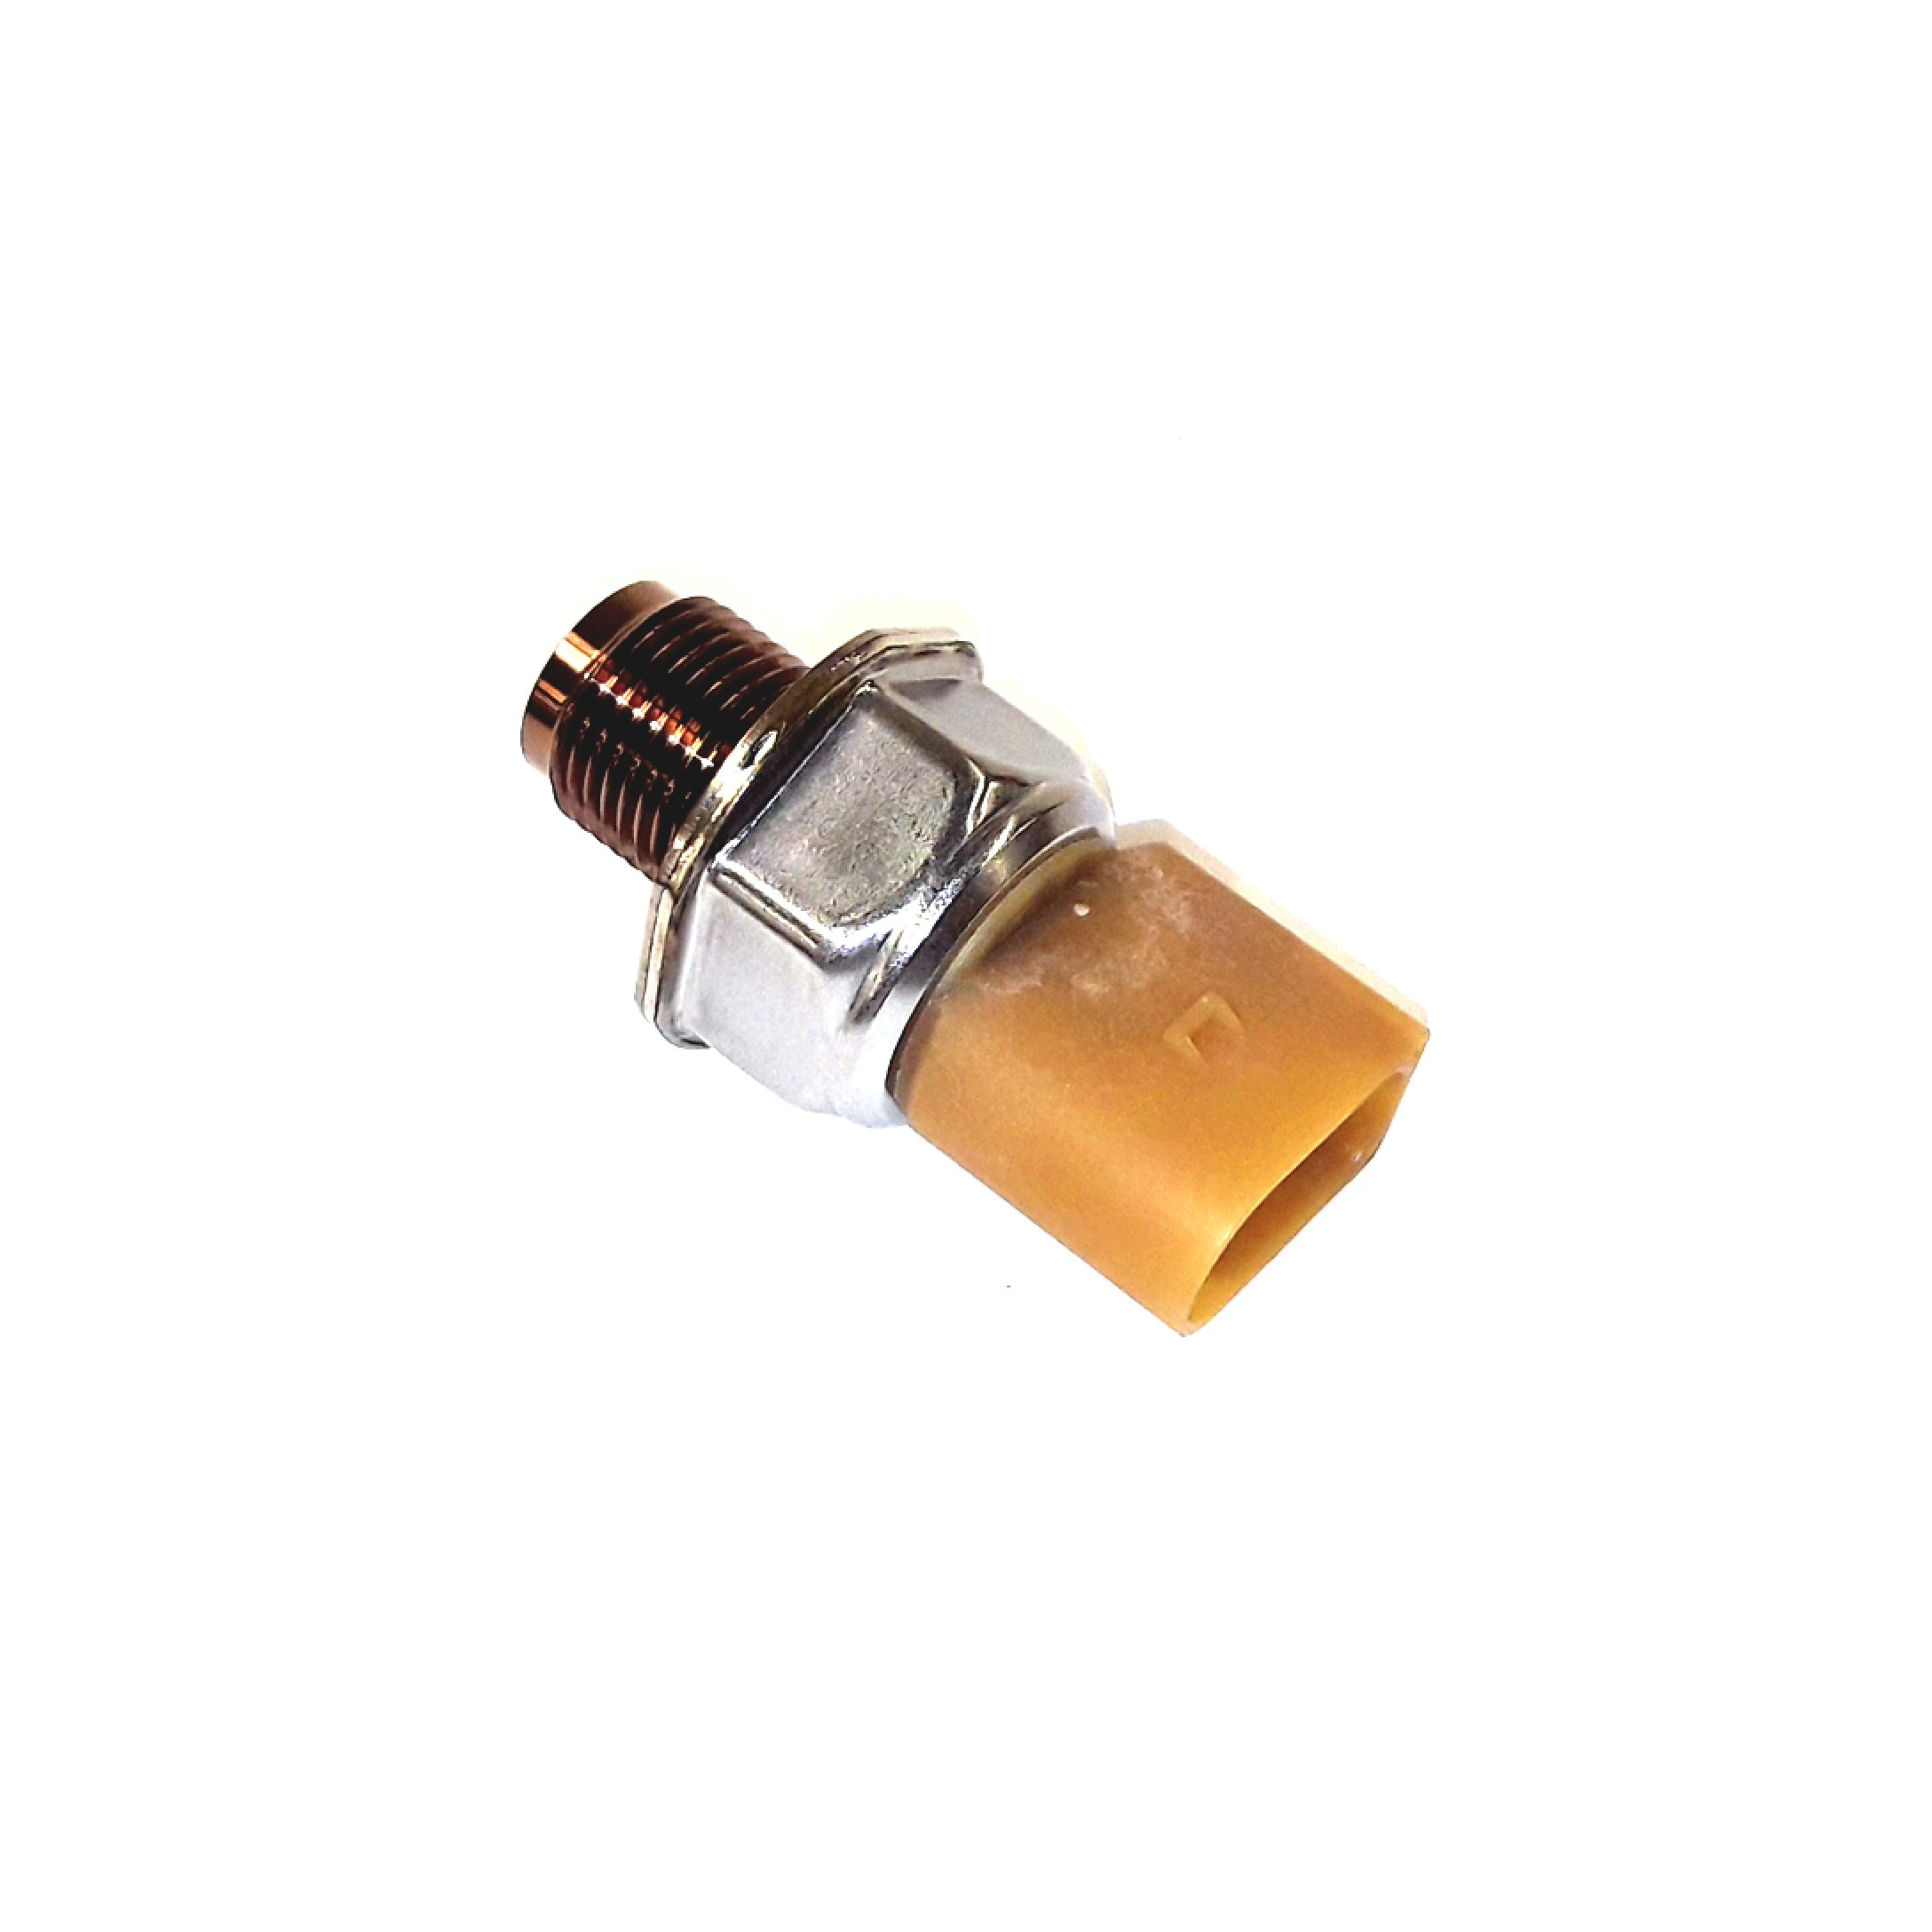 Audi Of Bellevue >> 03L906054A - Volkswagen Fuel Pressure Sensor. Pressure sensor. 2.0 LITER. AUDI; Volkswagen | the ...